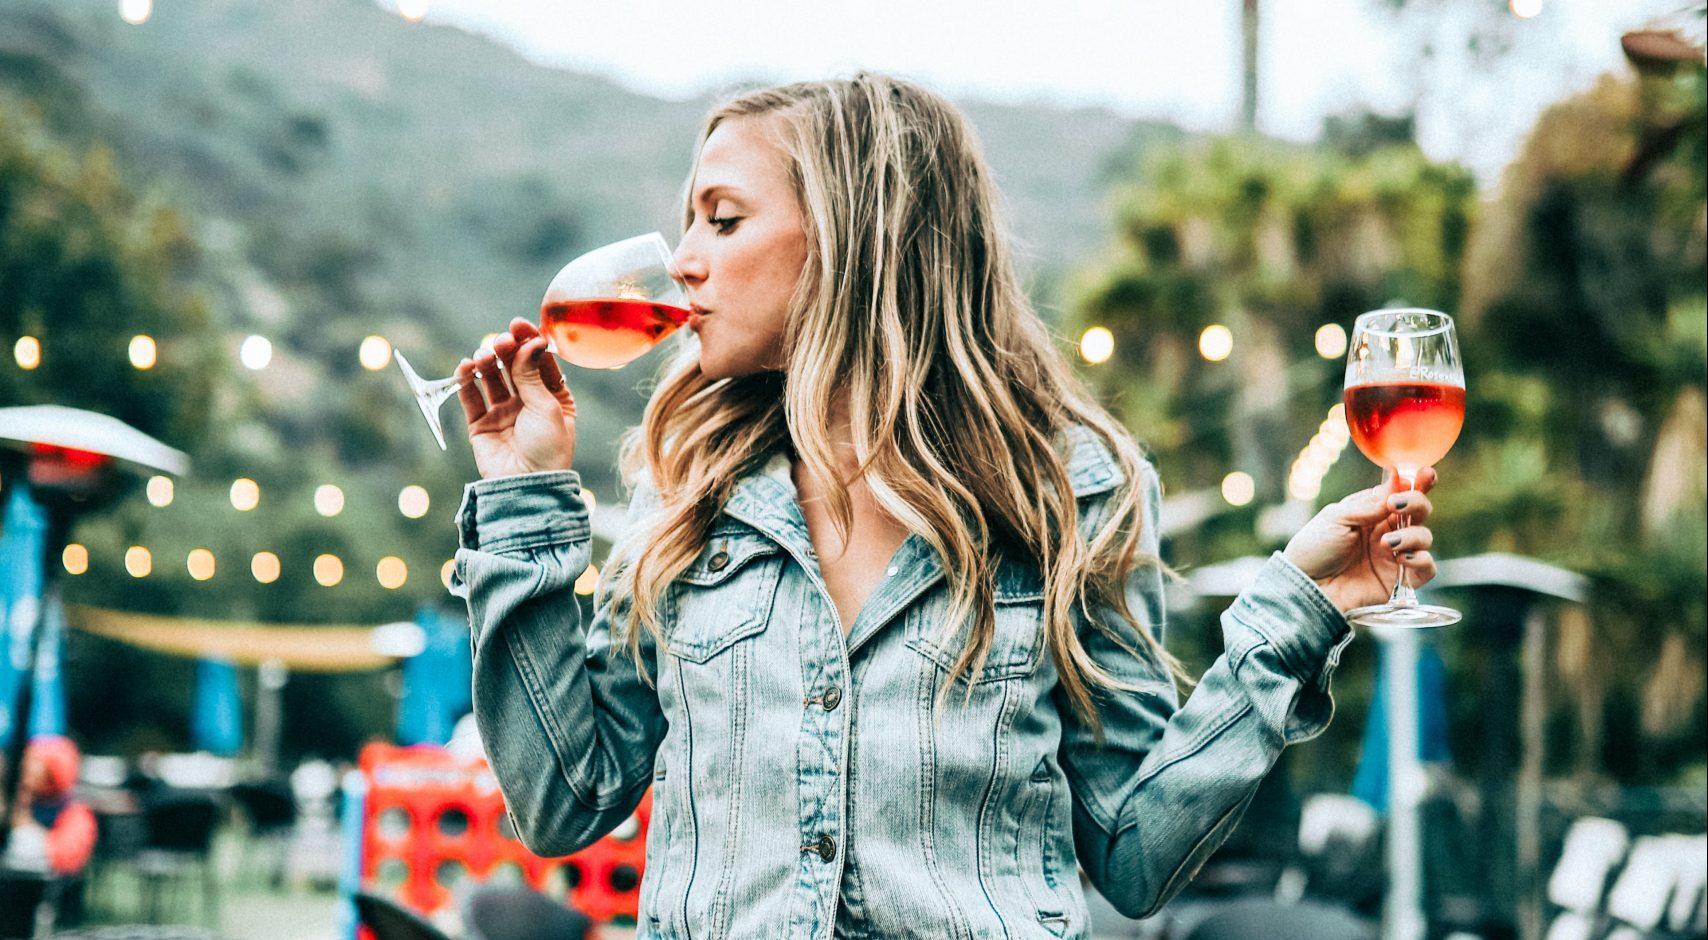 Mennyi kalória van egy pohár alkoholban?